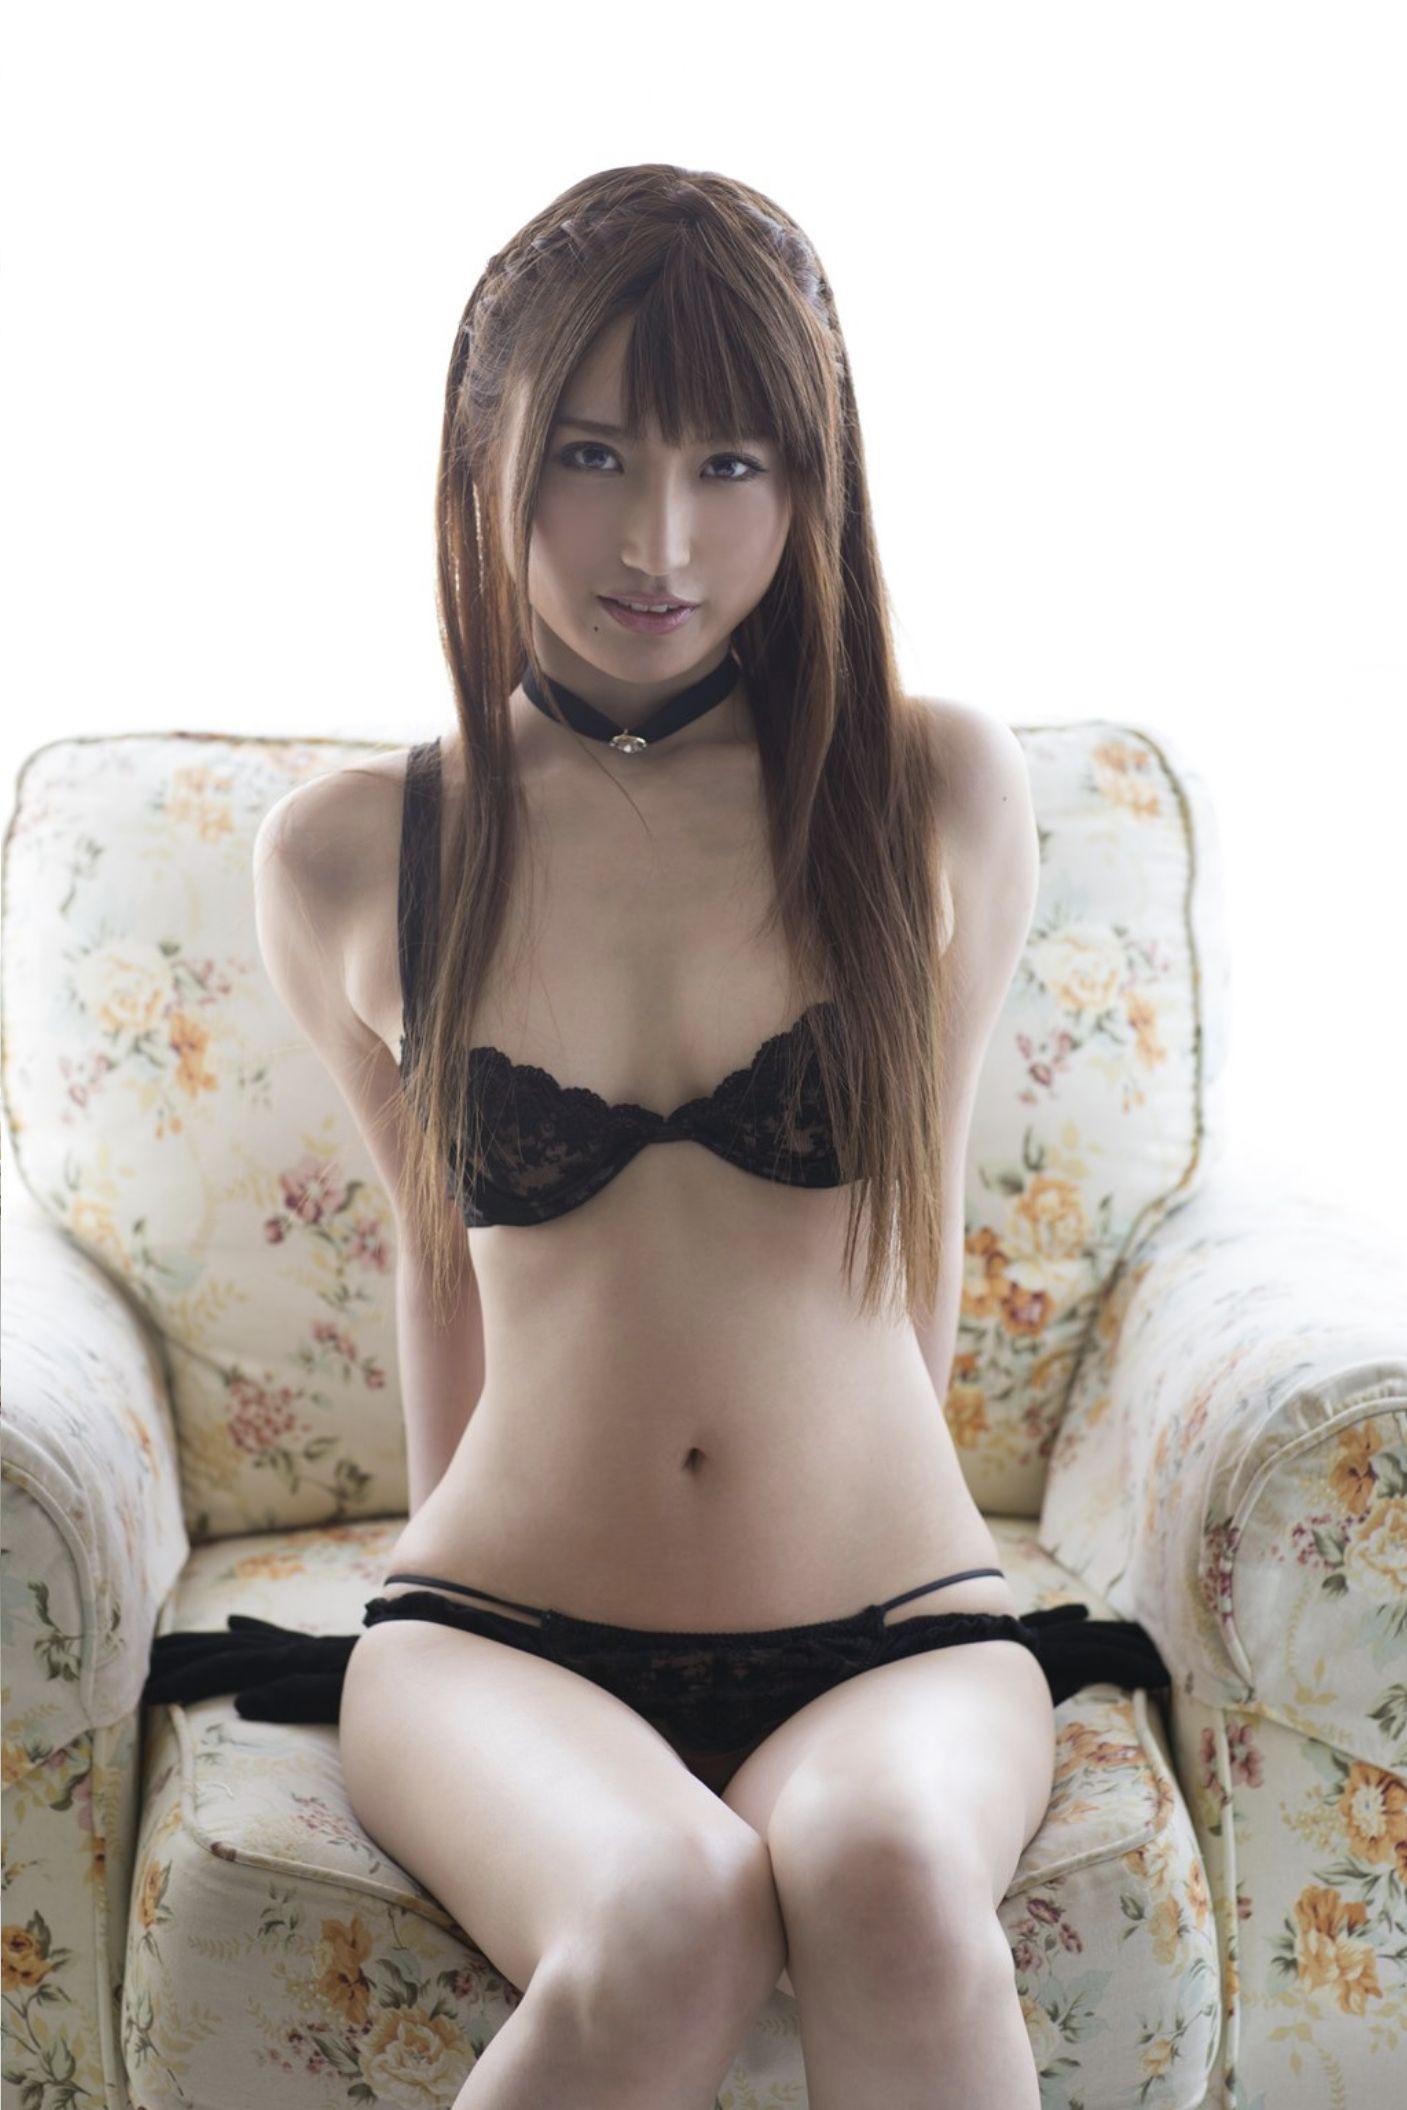 AVデビュー直前ヌード 愛沢かりん photo 005